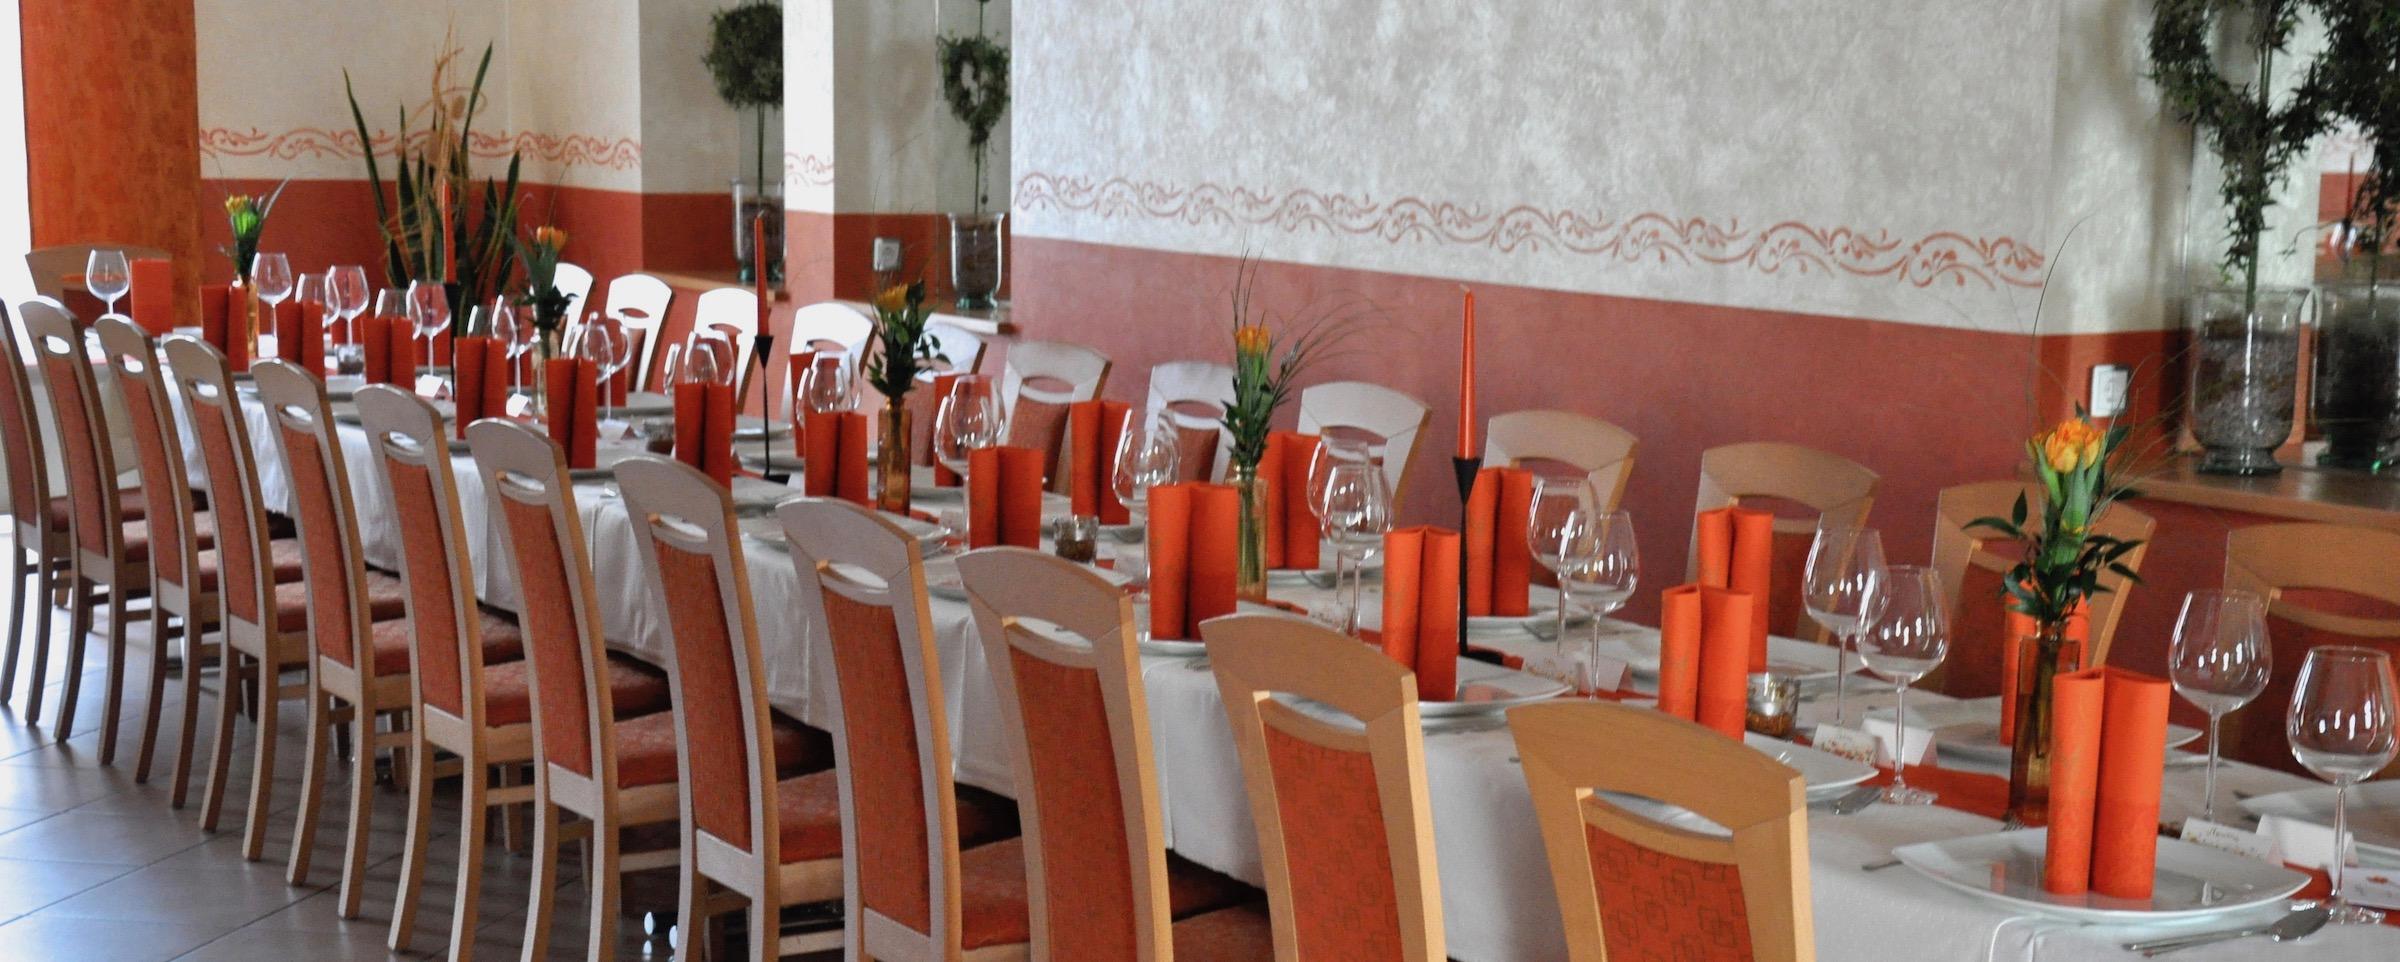 Culinarium Tisch | Metzgerei Herpich in Hof